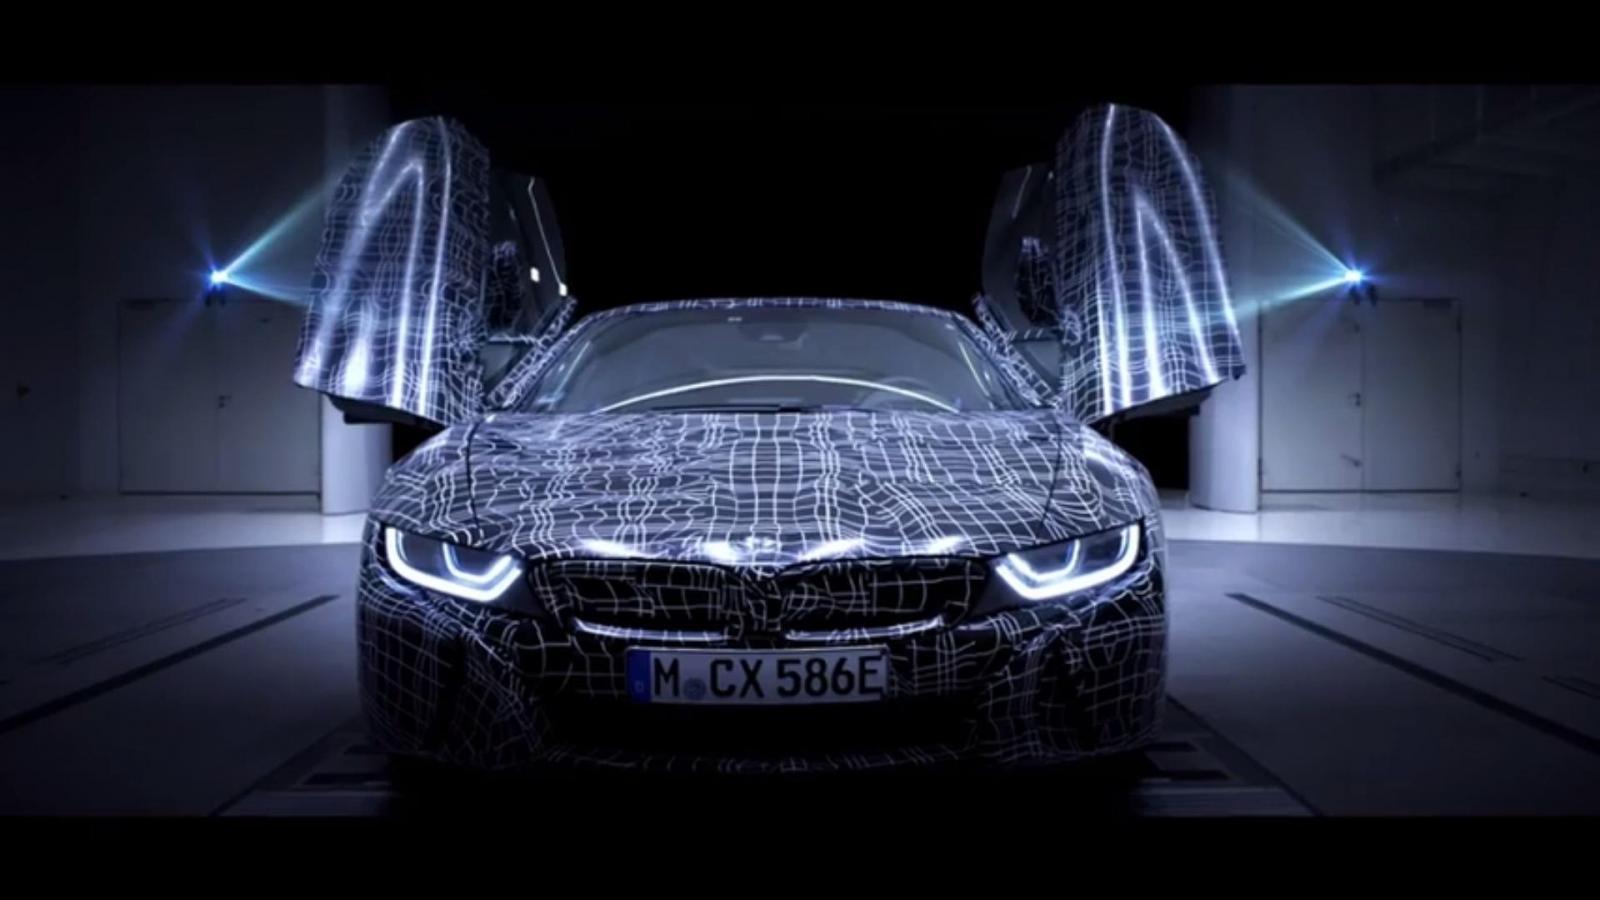 Видео-тизер рассекретил особенности новинки BMW i8 Roadster